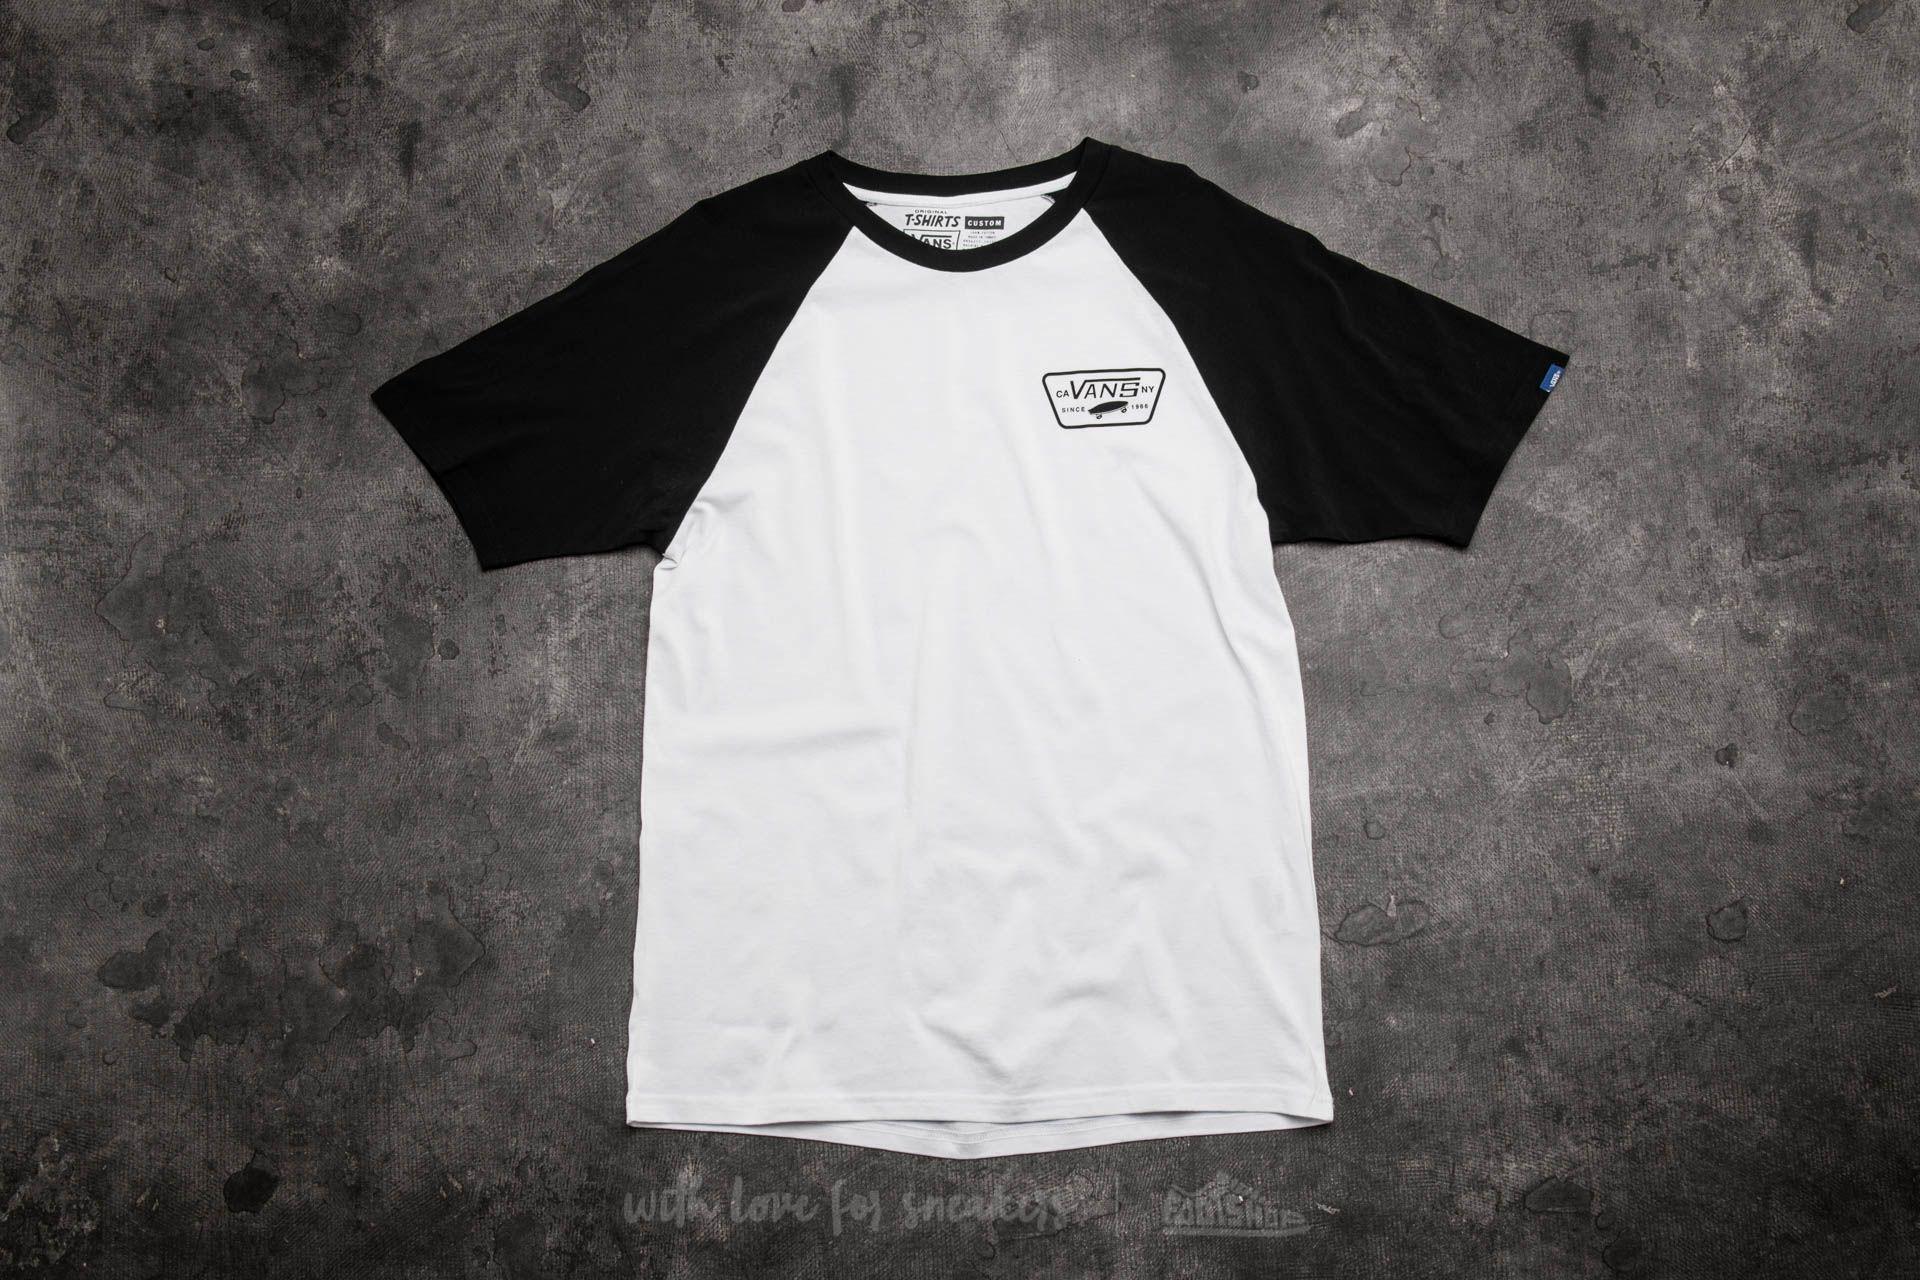 64deeaf1e9 Vans Full Patch Short Sleeve Raglan Tee White-Black